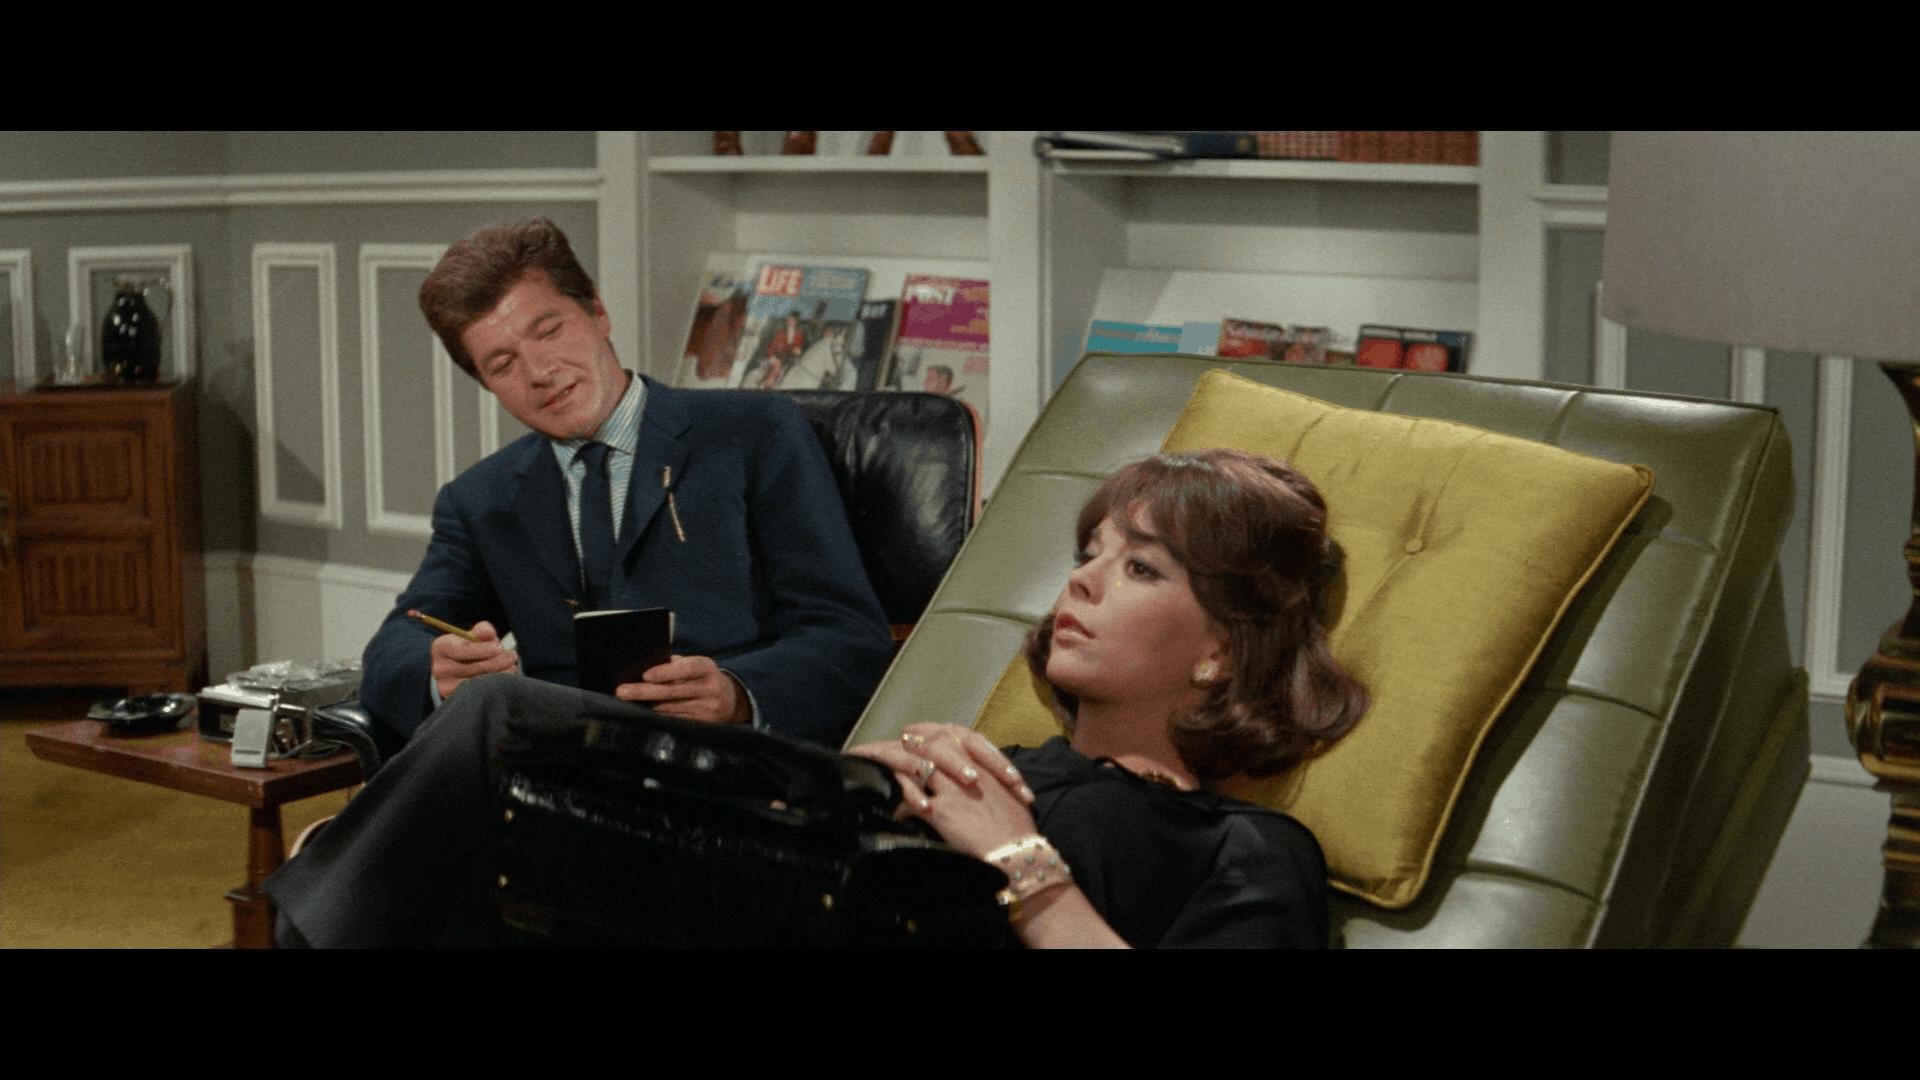 Penelope Warner Archive Blu-ray 6